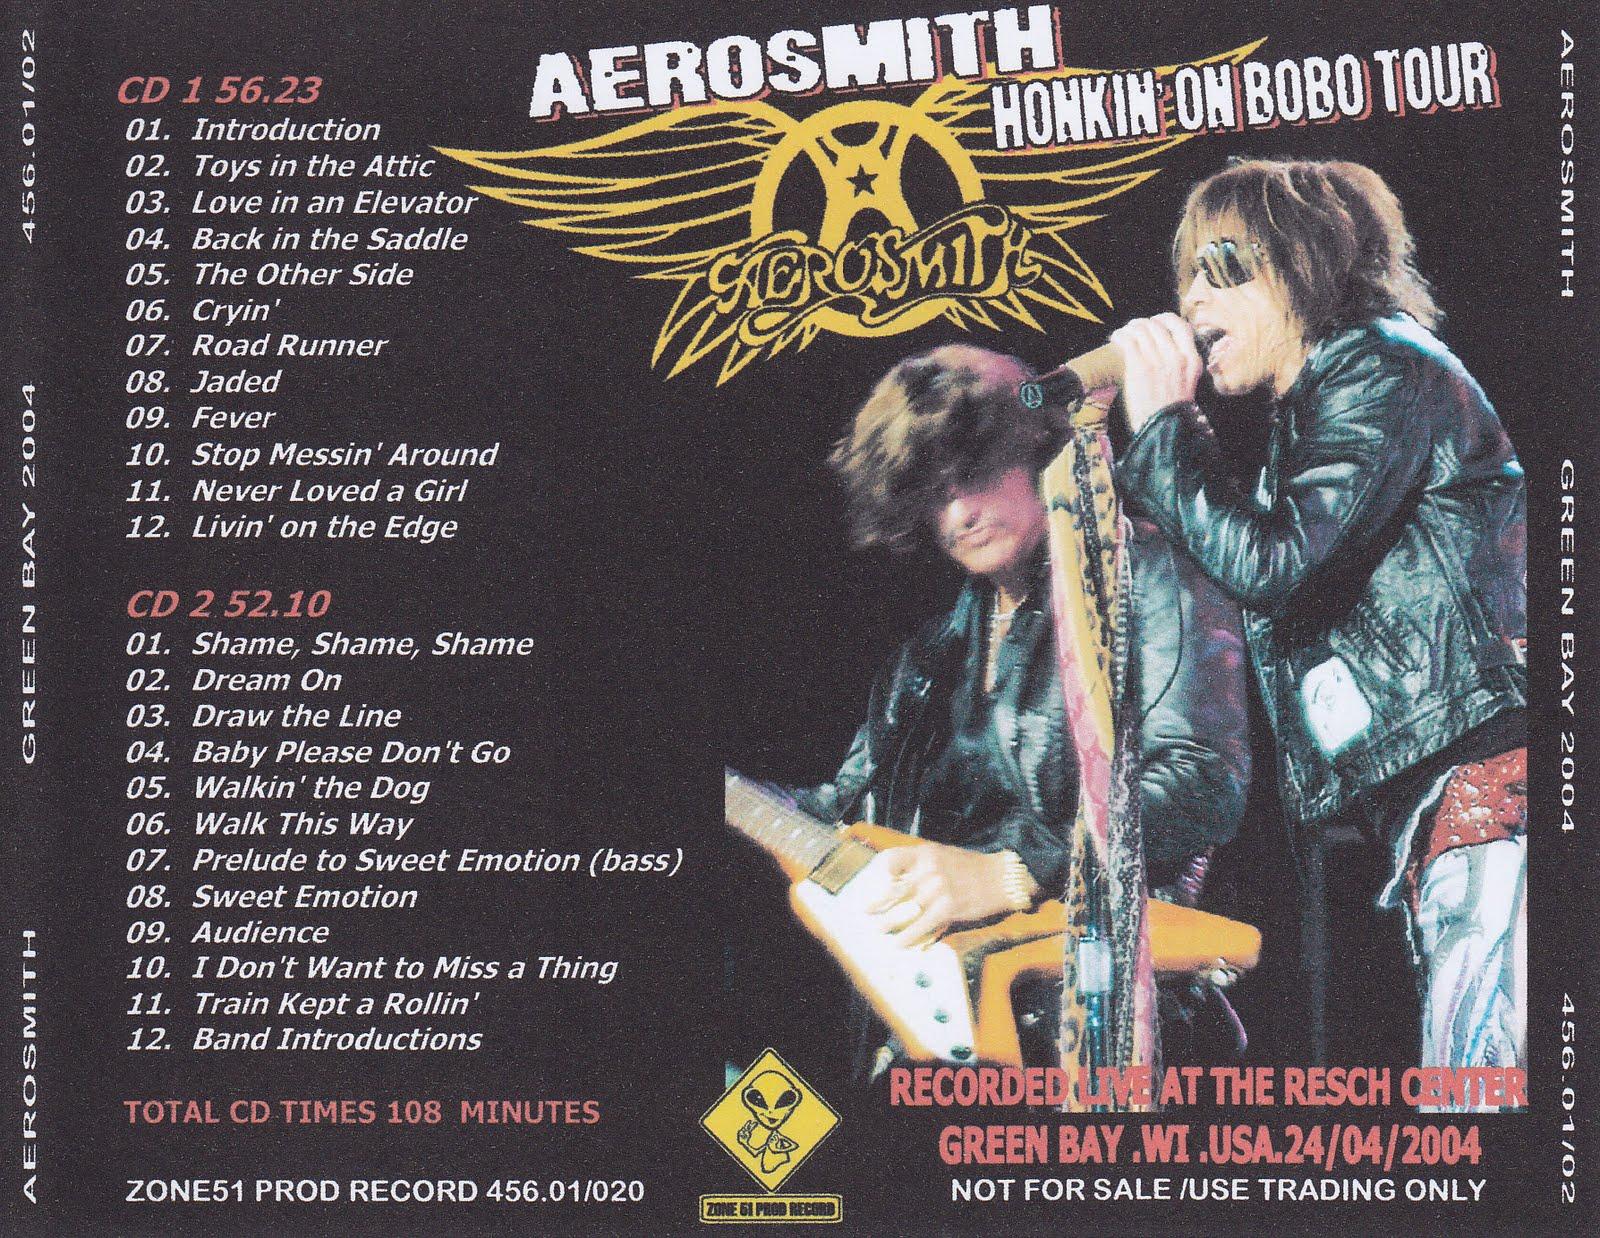 Aerosmith Bootlegs Cover Arts Green Bay 2004